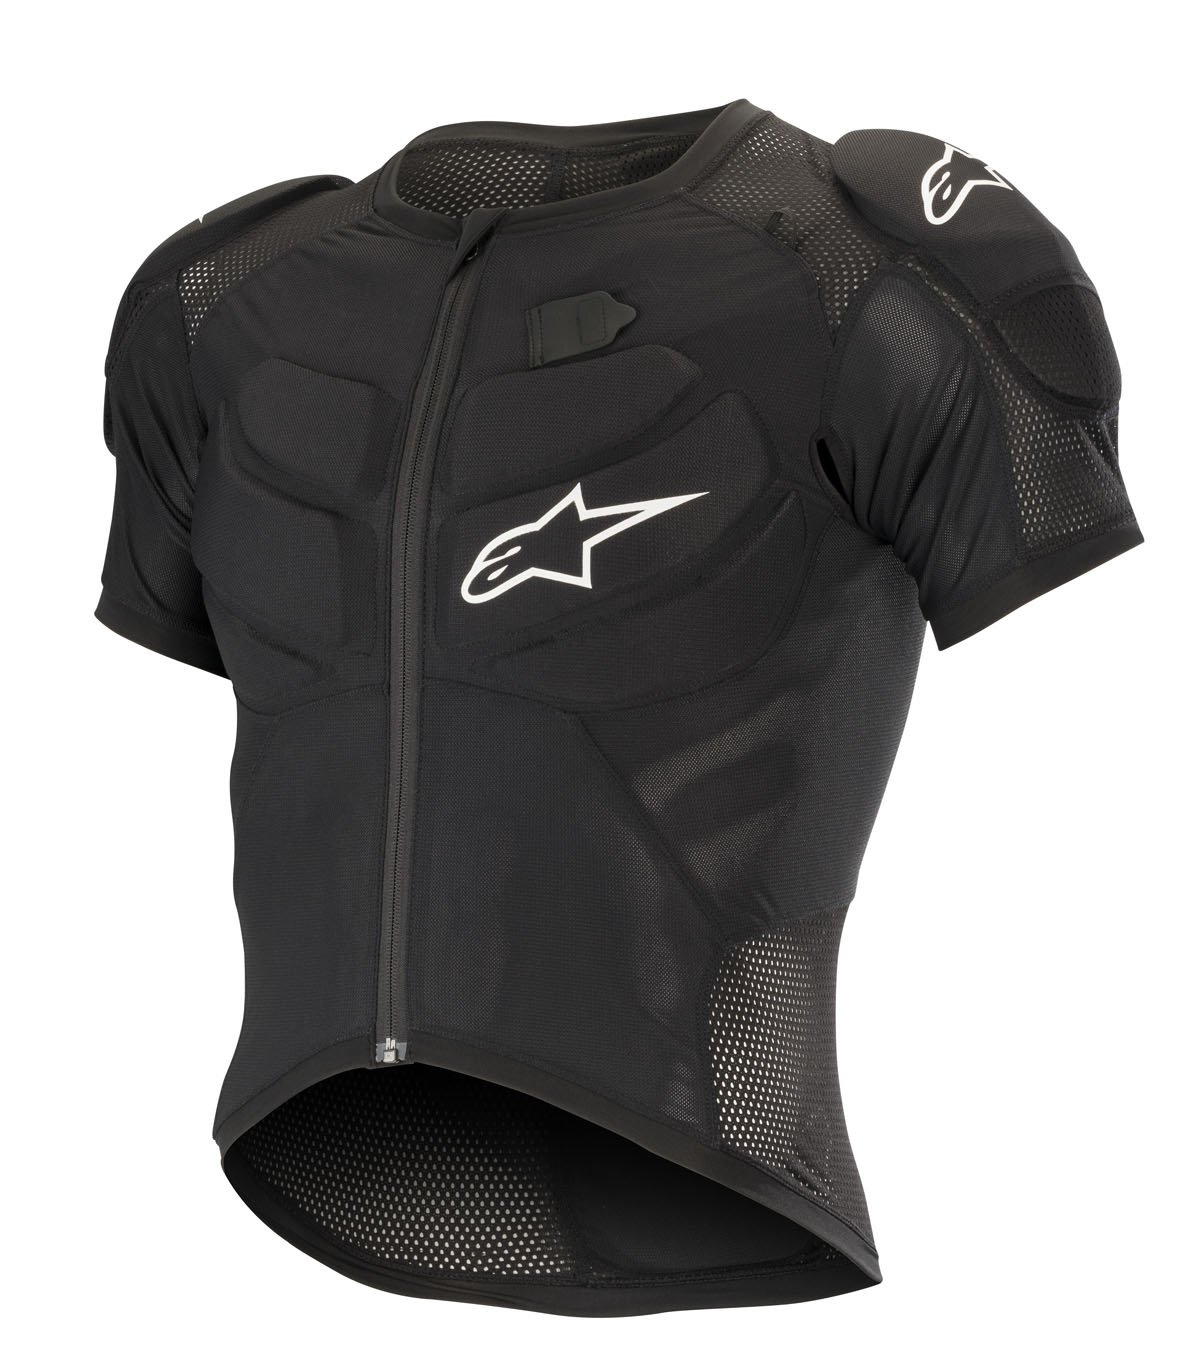 Alpinestars Vector Tech Protection kortærmet body armor | Beskyttelse